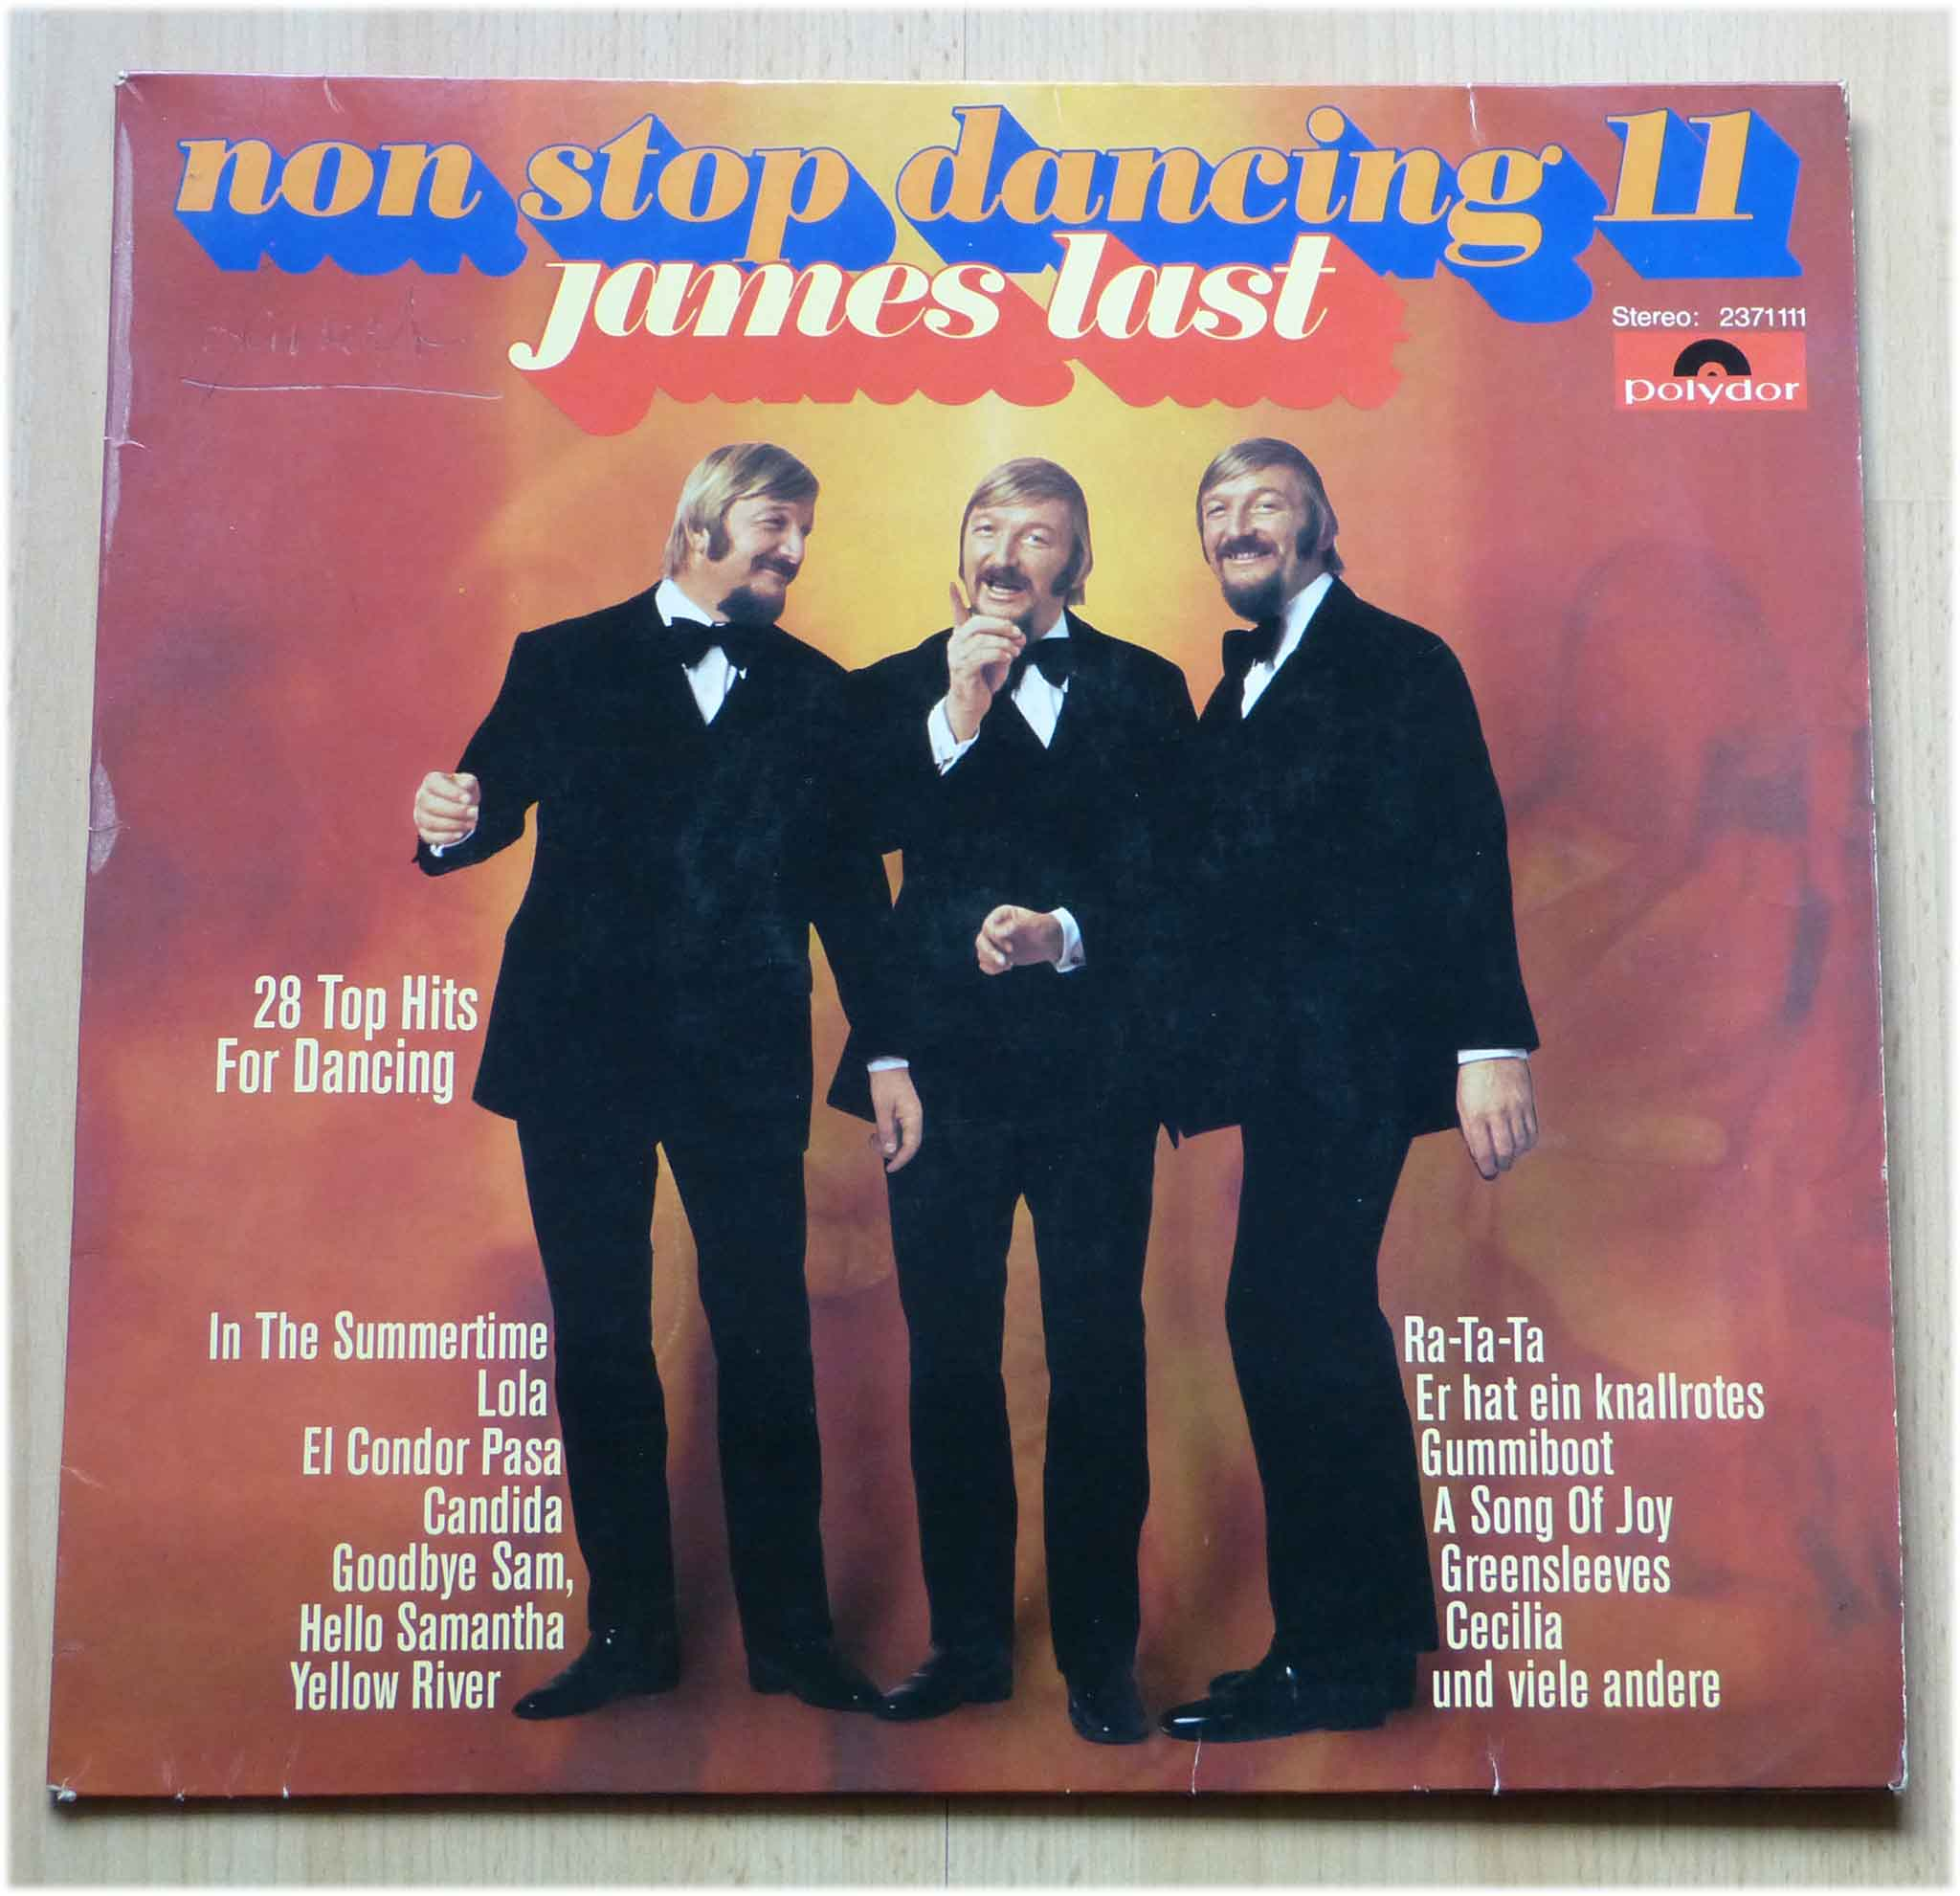 James Last - Non Stop Dancing